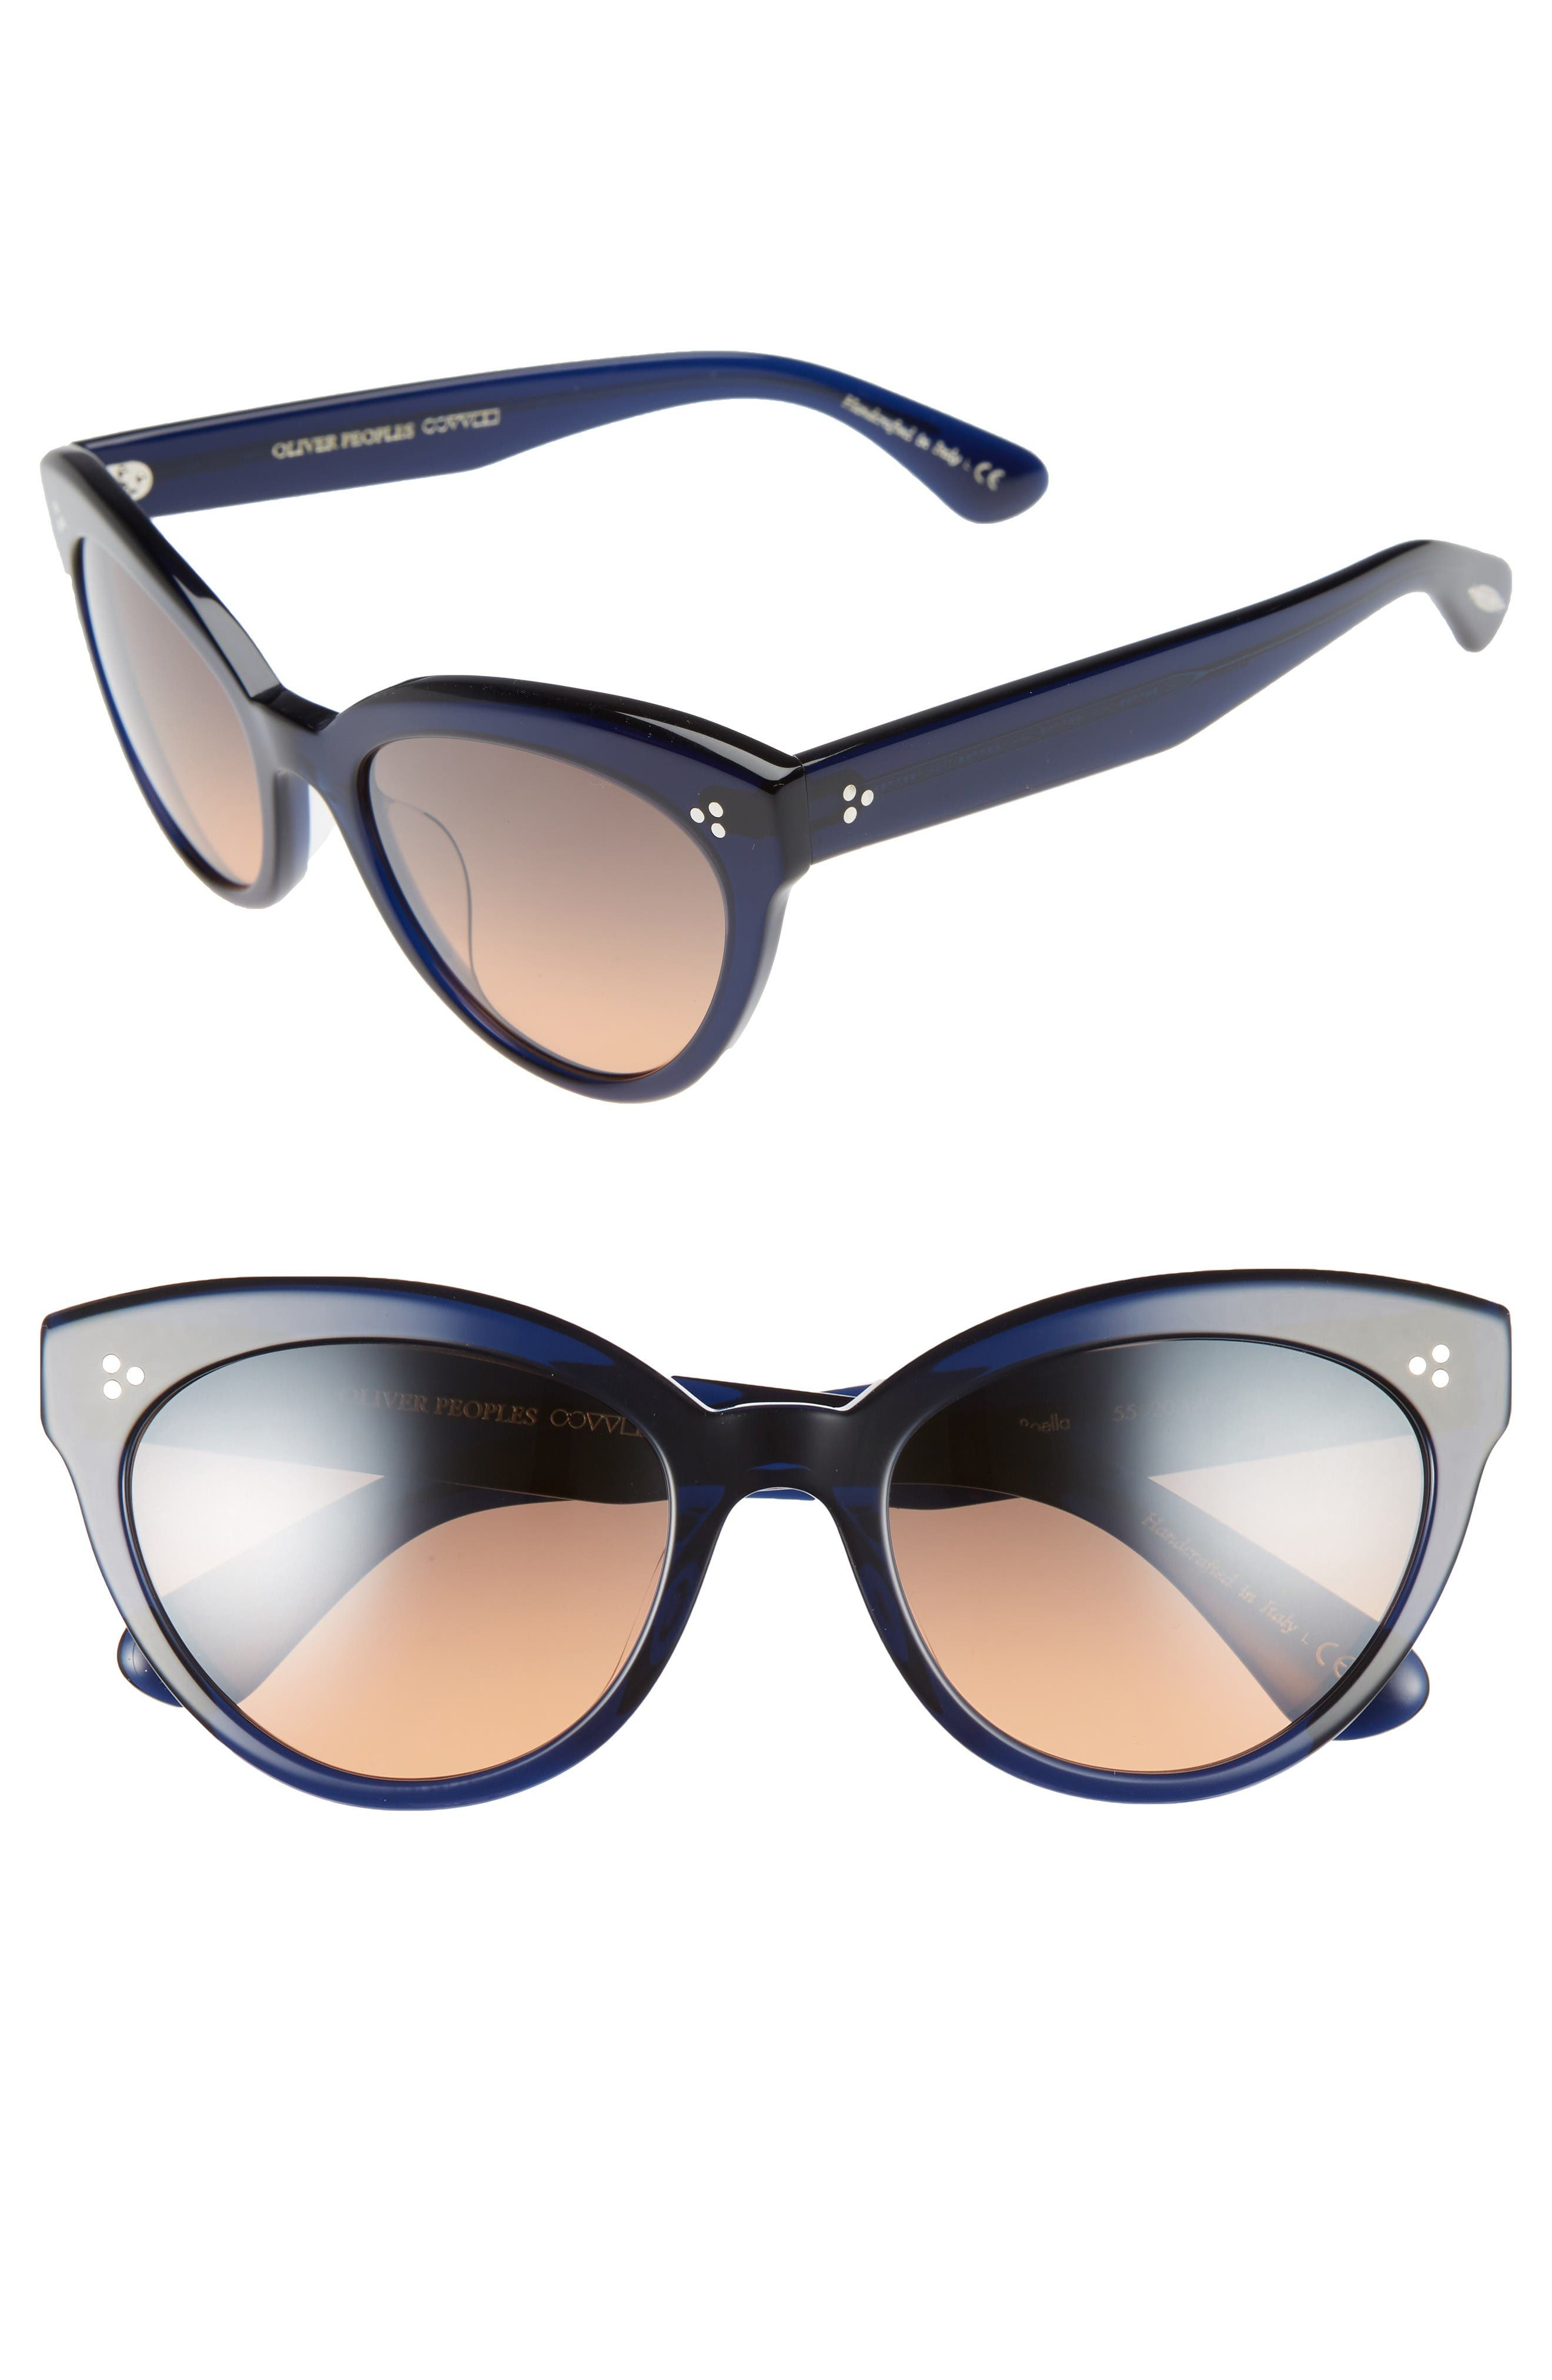 Roella 55mm Cat Eye Sunglasses,                         Main,                         color, Blue